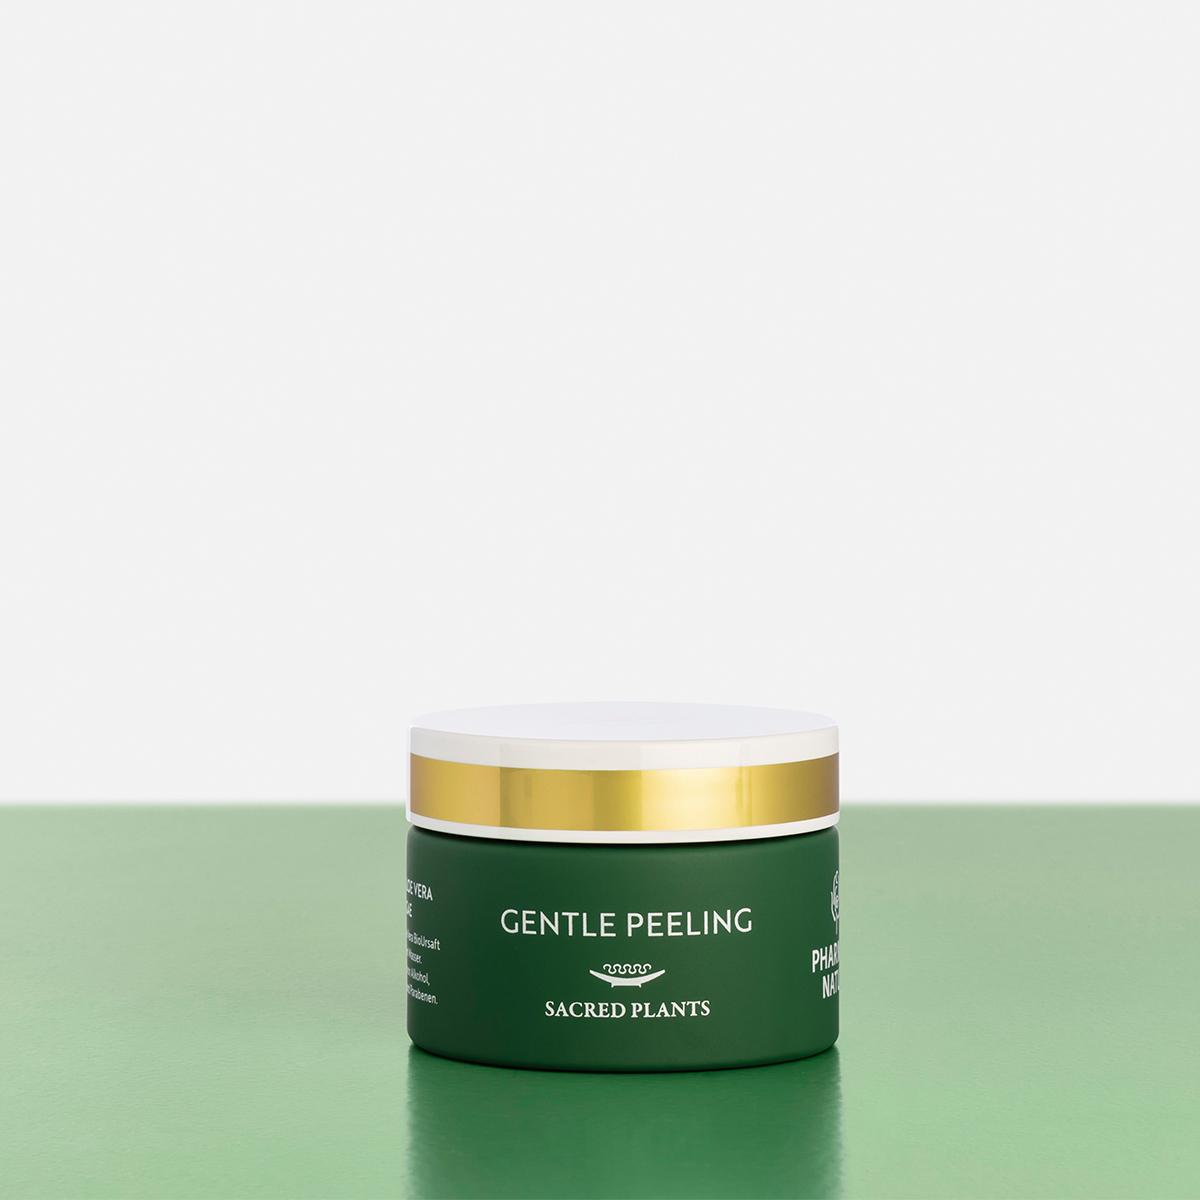 Grünes Gentle Peeling Produktbild